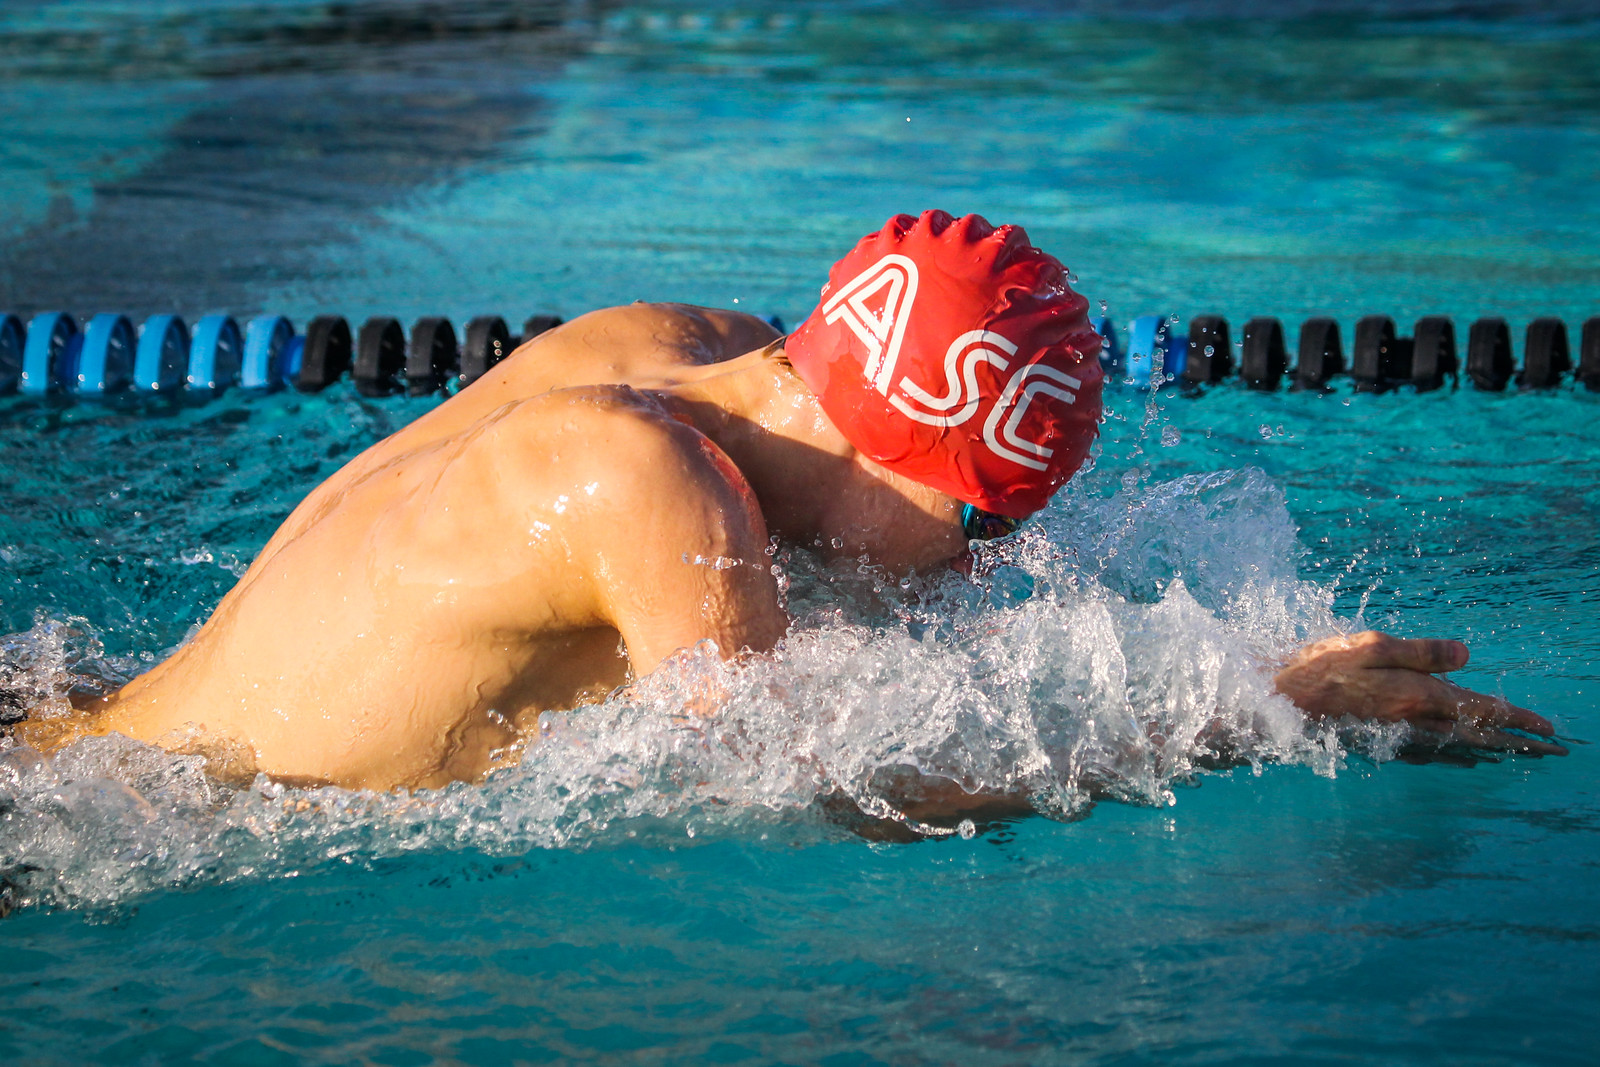 IMAGE: https://photos.smugmug.com/Sports/Swimming/Seals-Photos-2019/Armstrong-Walter/i-G7B55qM/1/7a85c64f/X3/A73X1346-X3.jpg